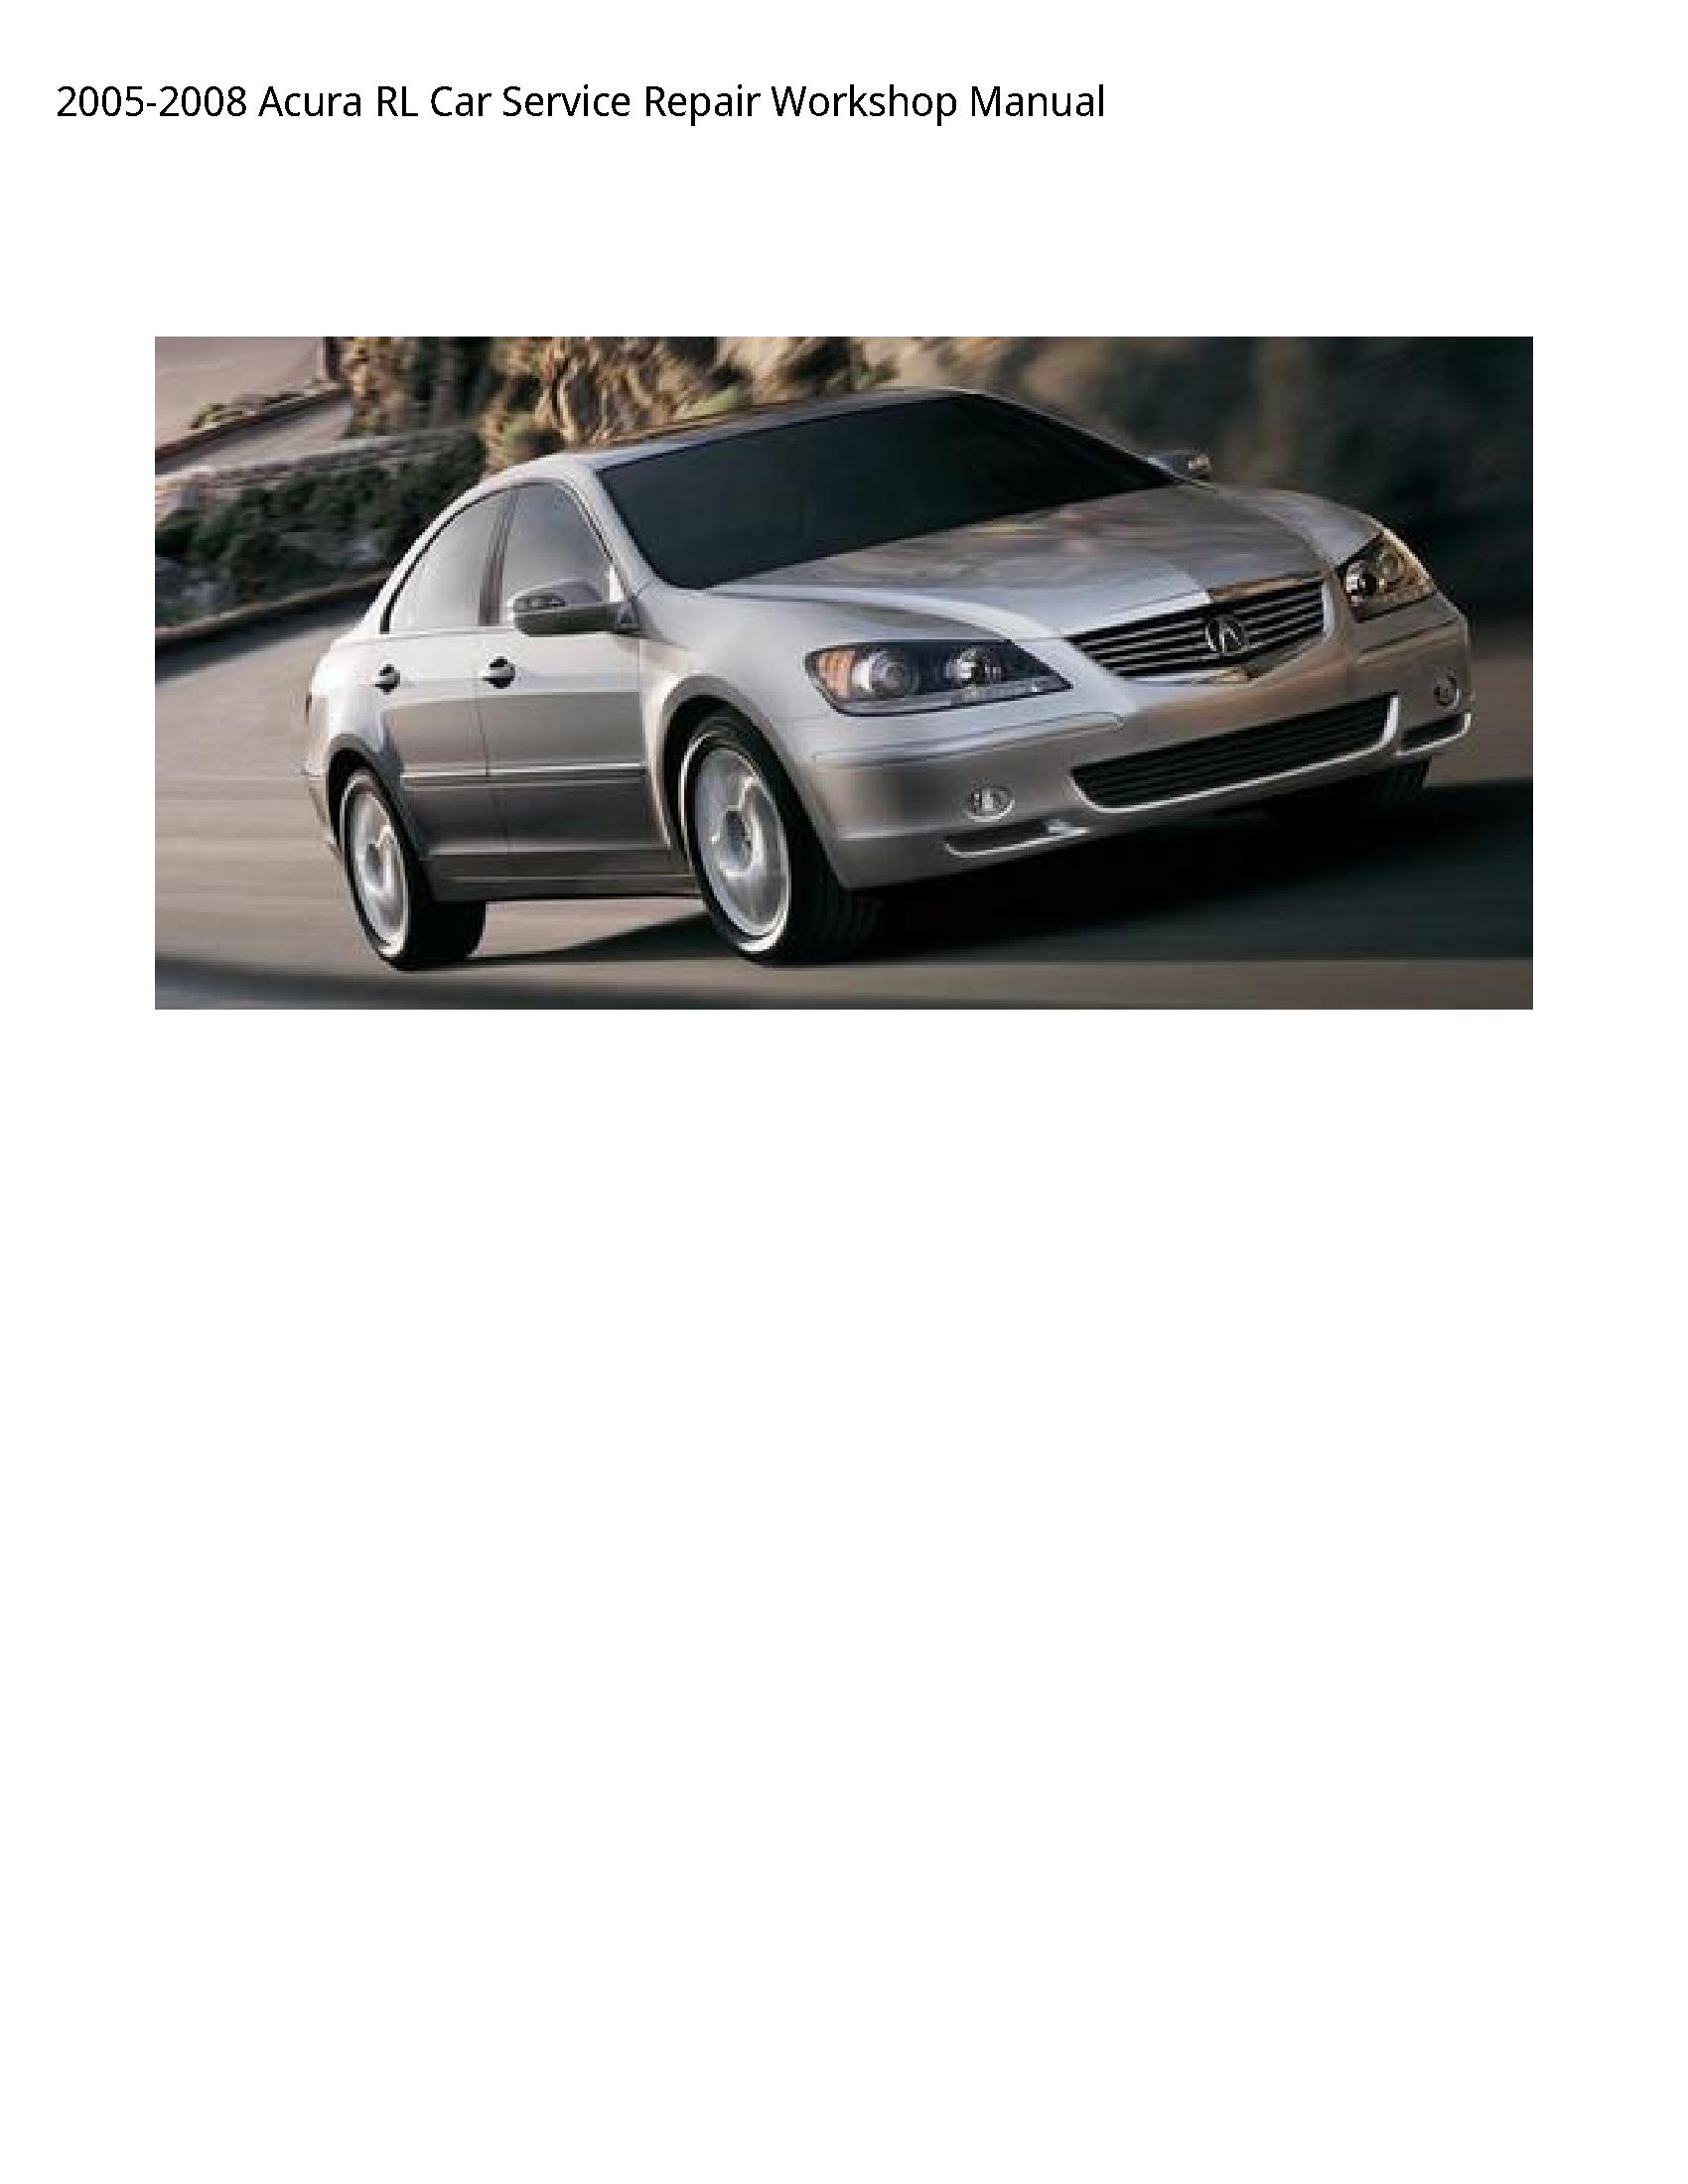 Acura RL Car manual